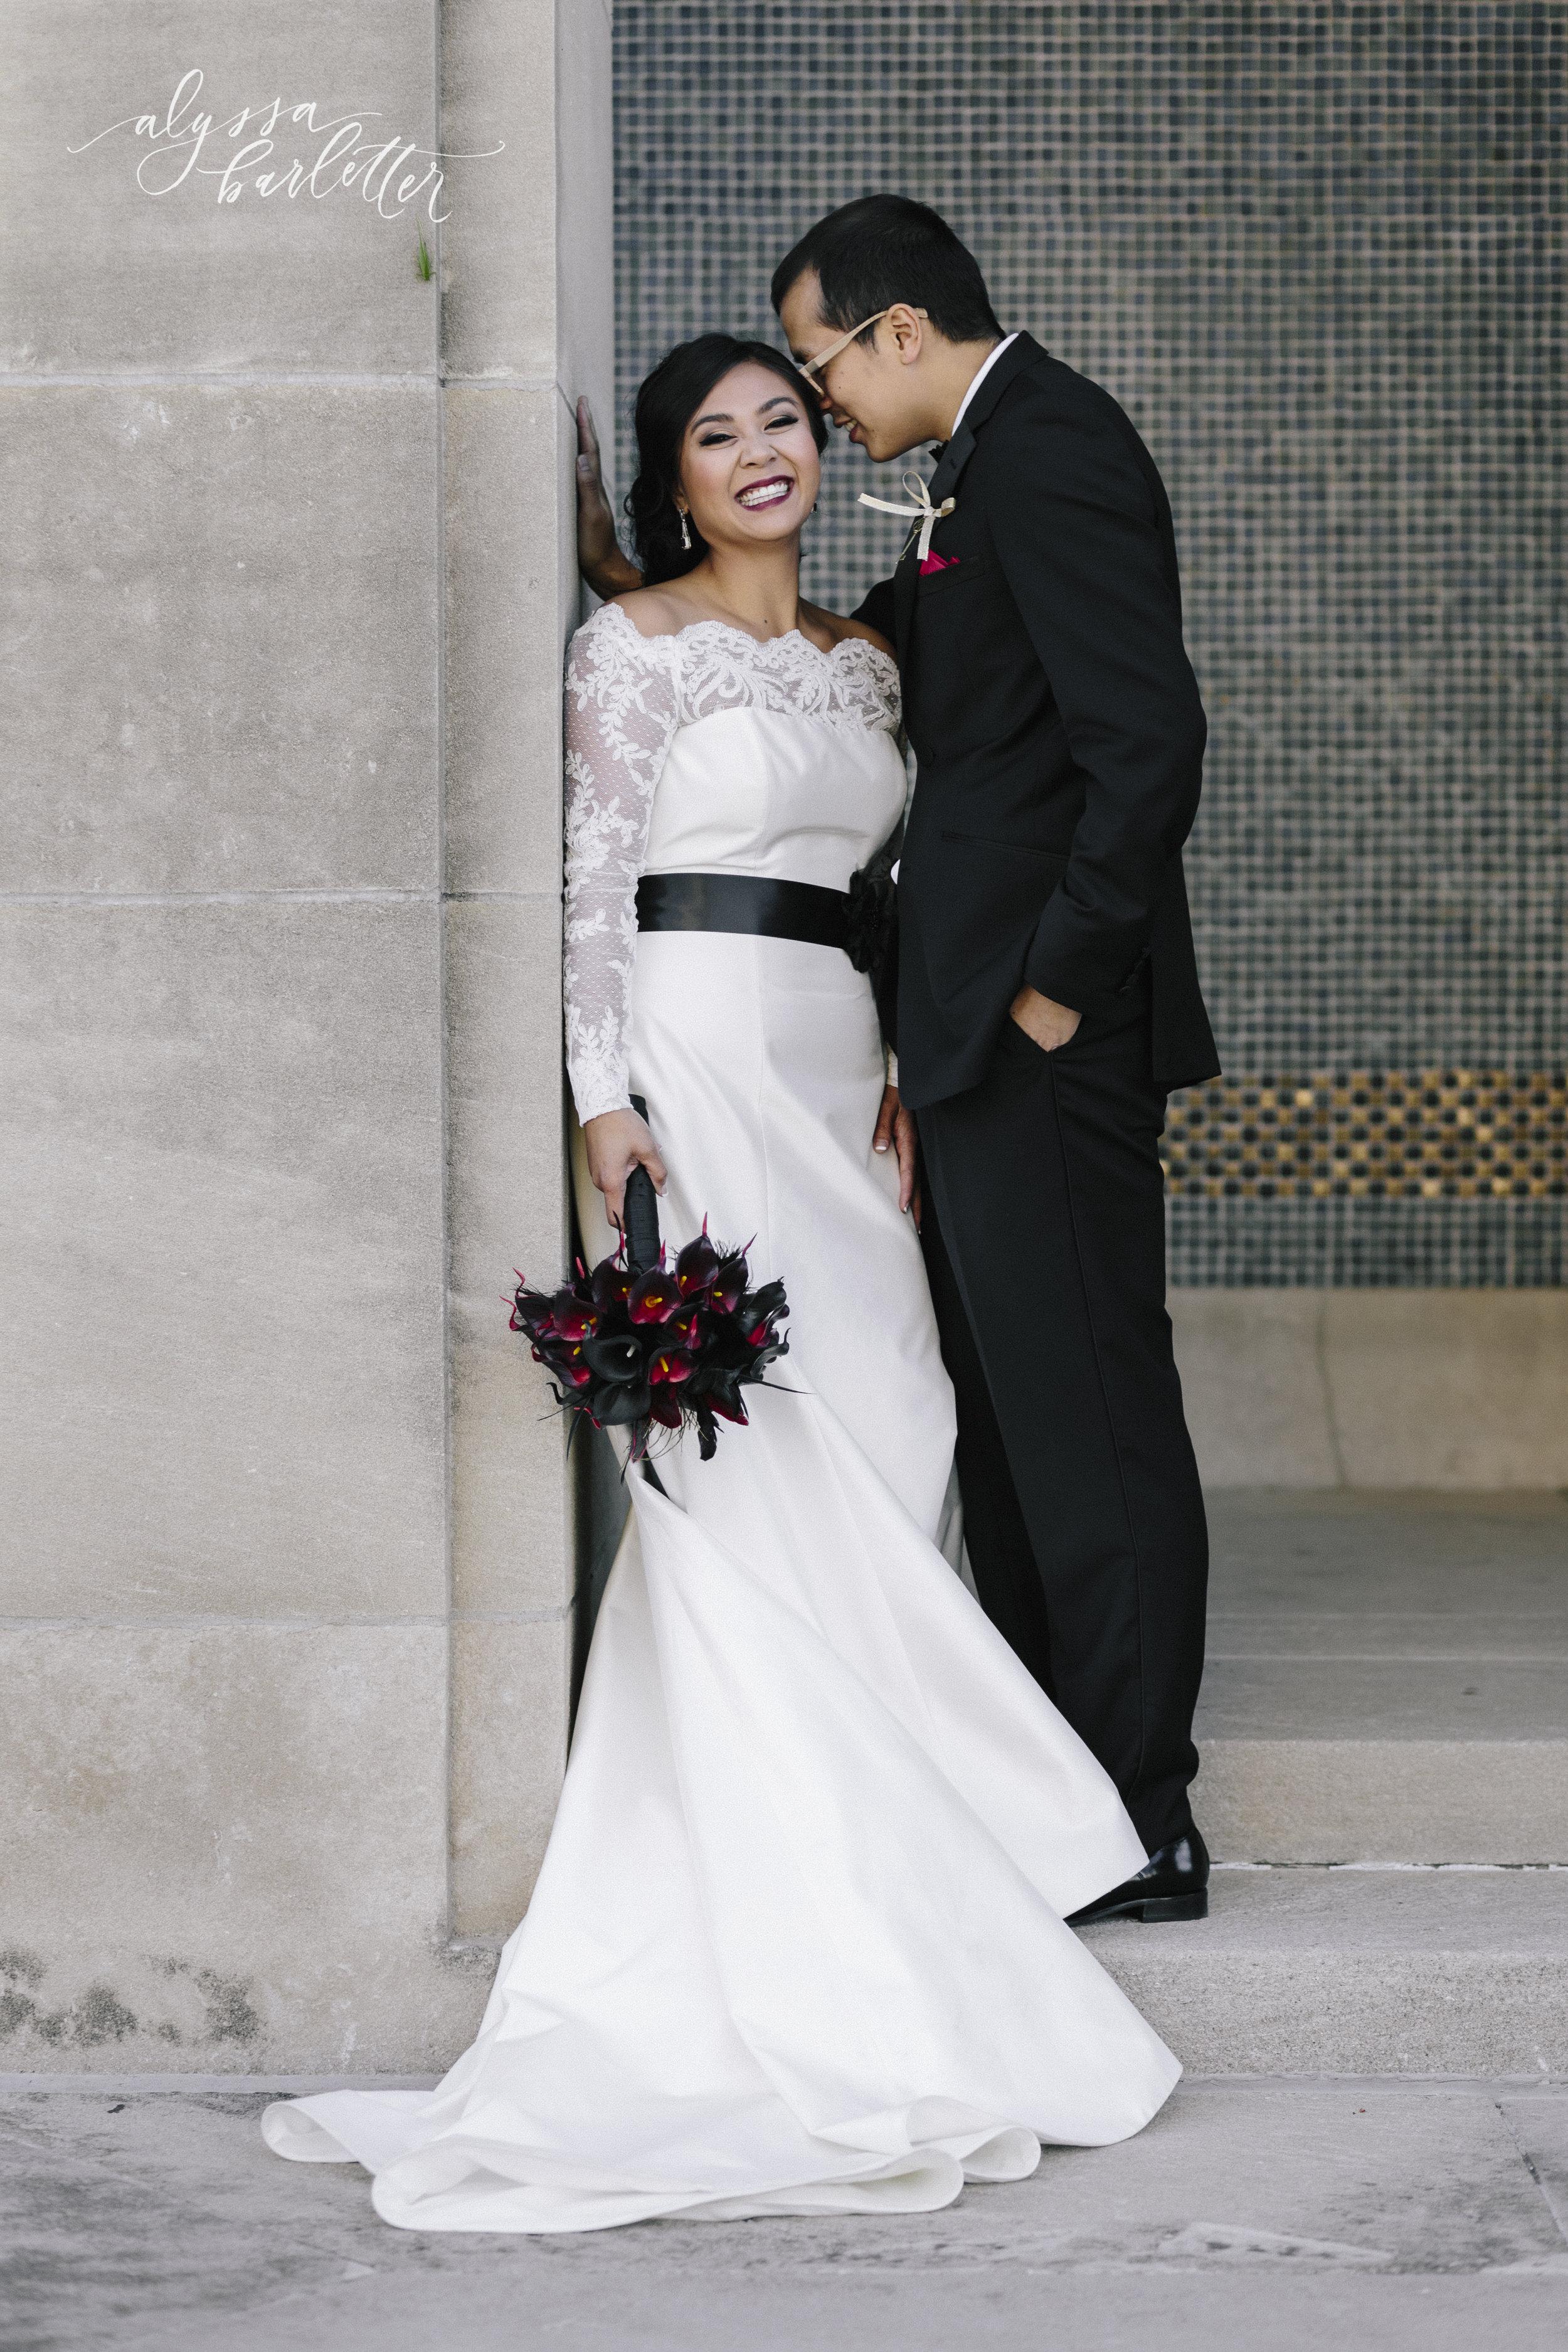 alyssa barletter photography union station wedding photos leopard print winter wedding-1-33.jpg